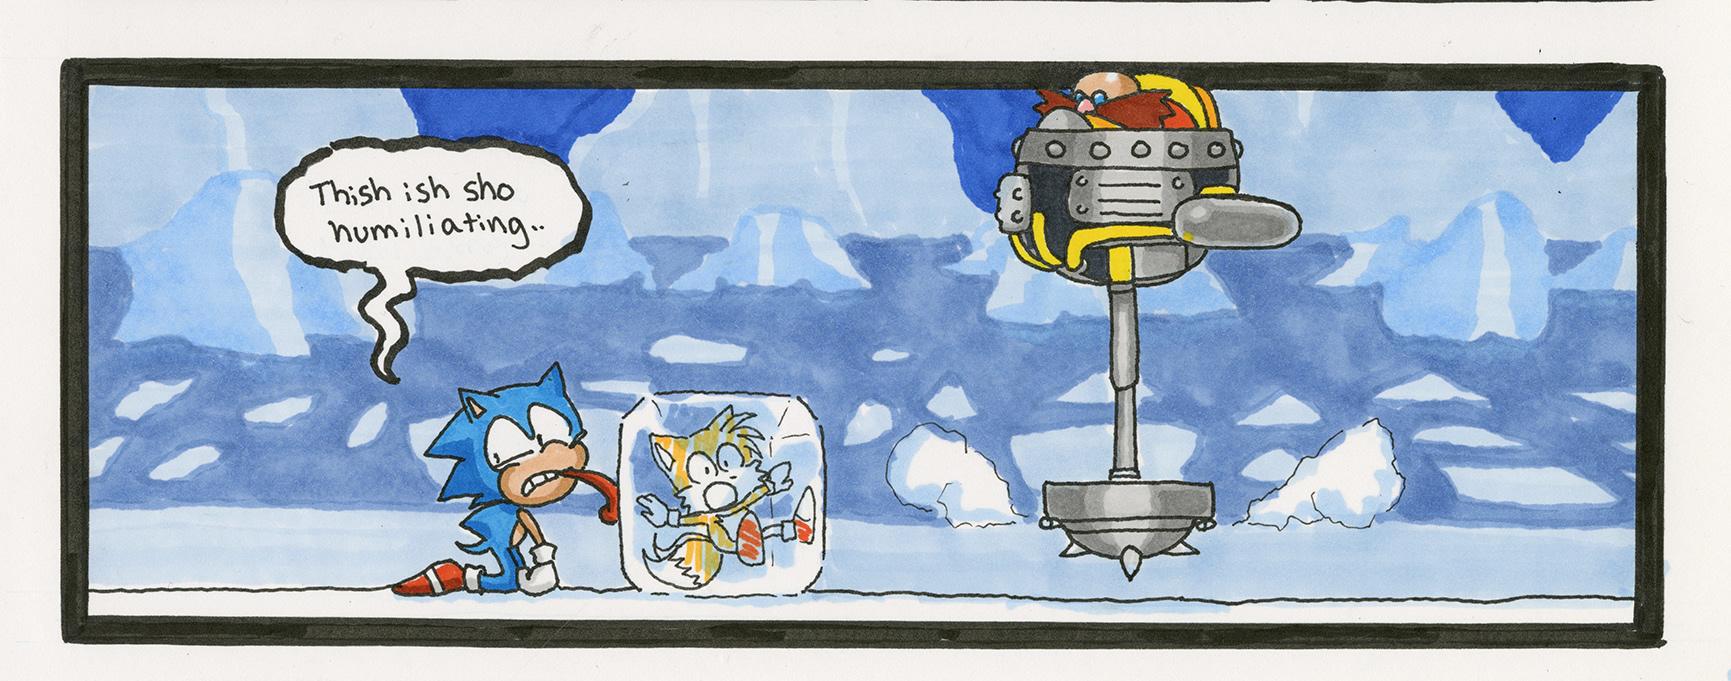 Sonic the Hedgehog 3: Icecap Zone Boss